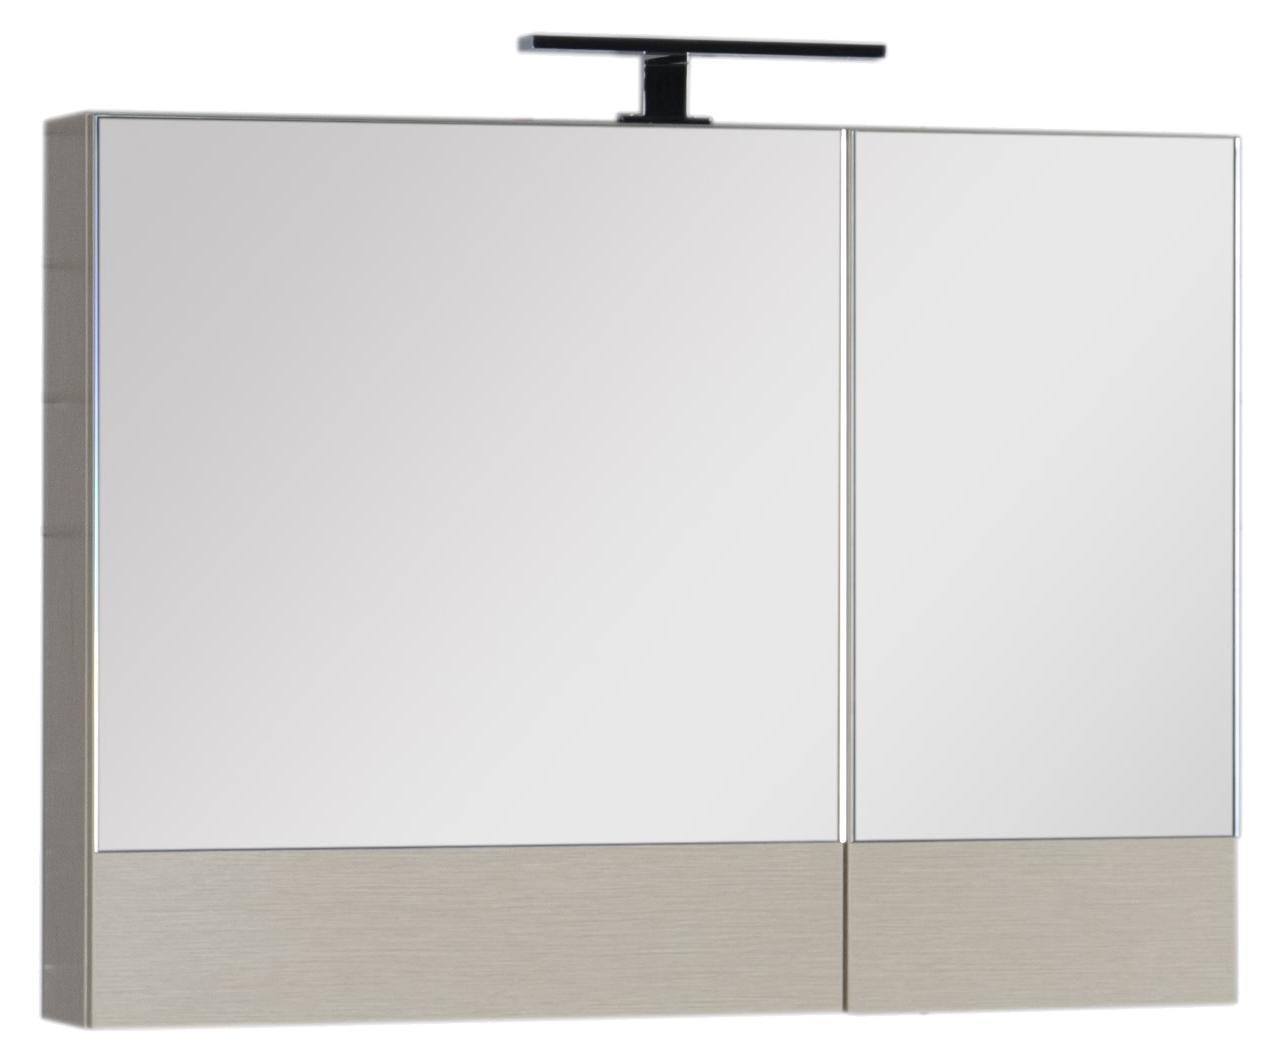 Зеркало-шкаф Aquanet Нота 90 камерино светлый дуб